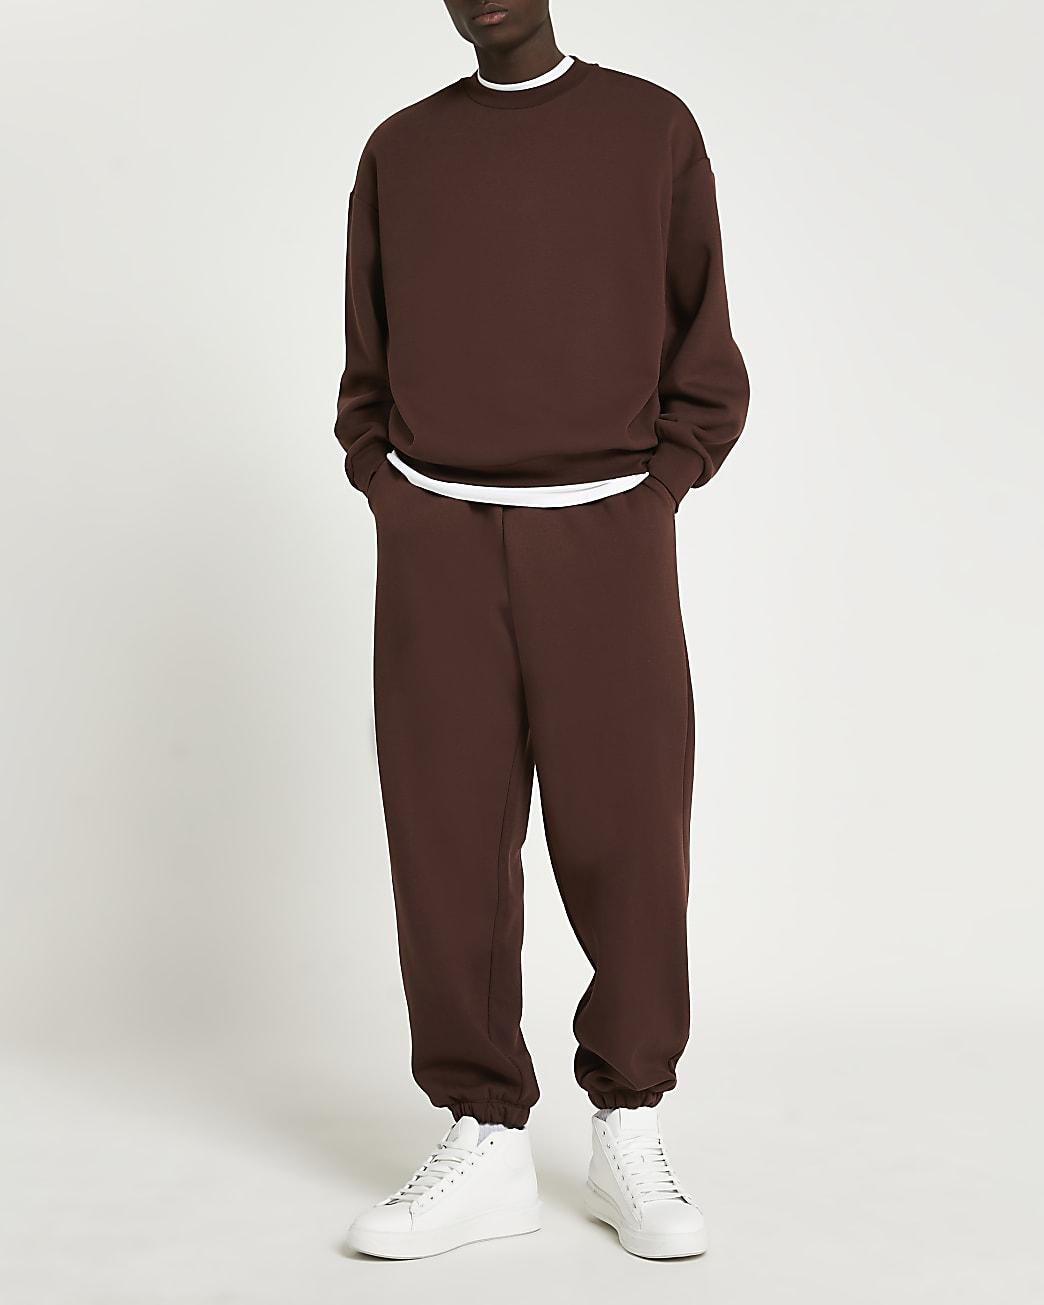 Brown oversized sweatshirt